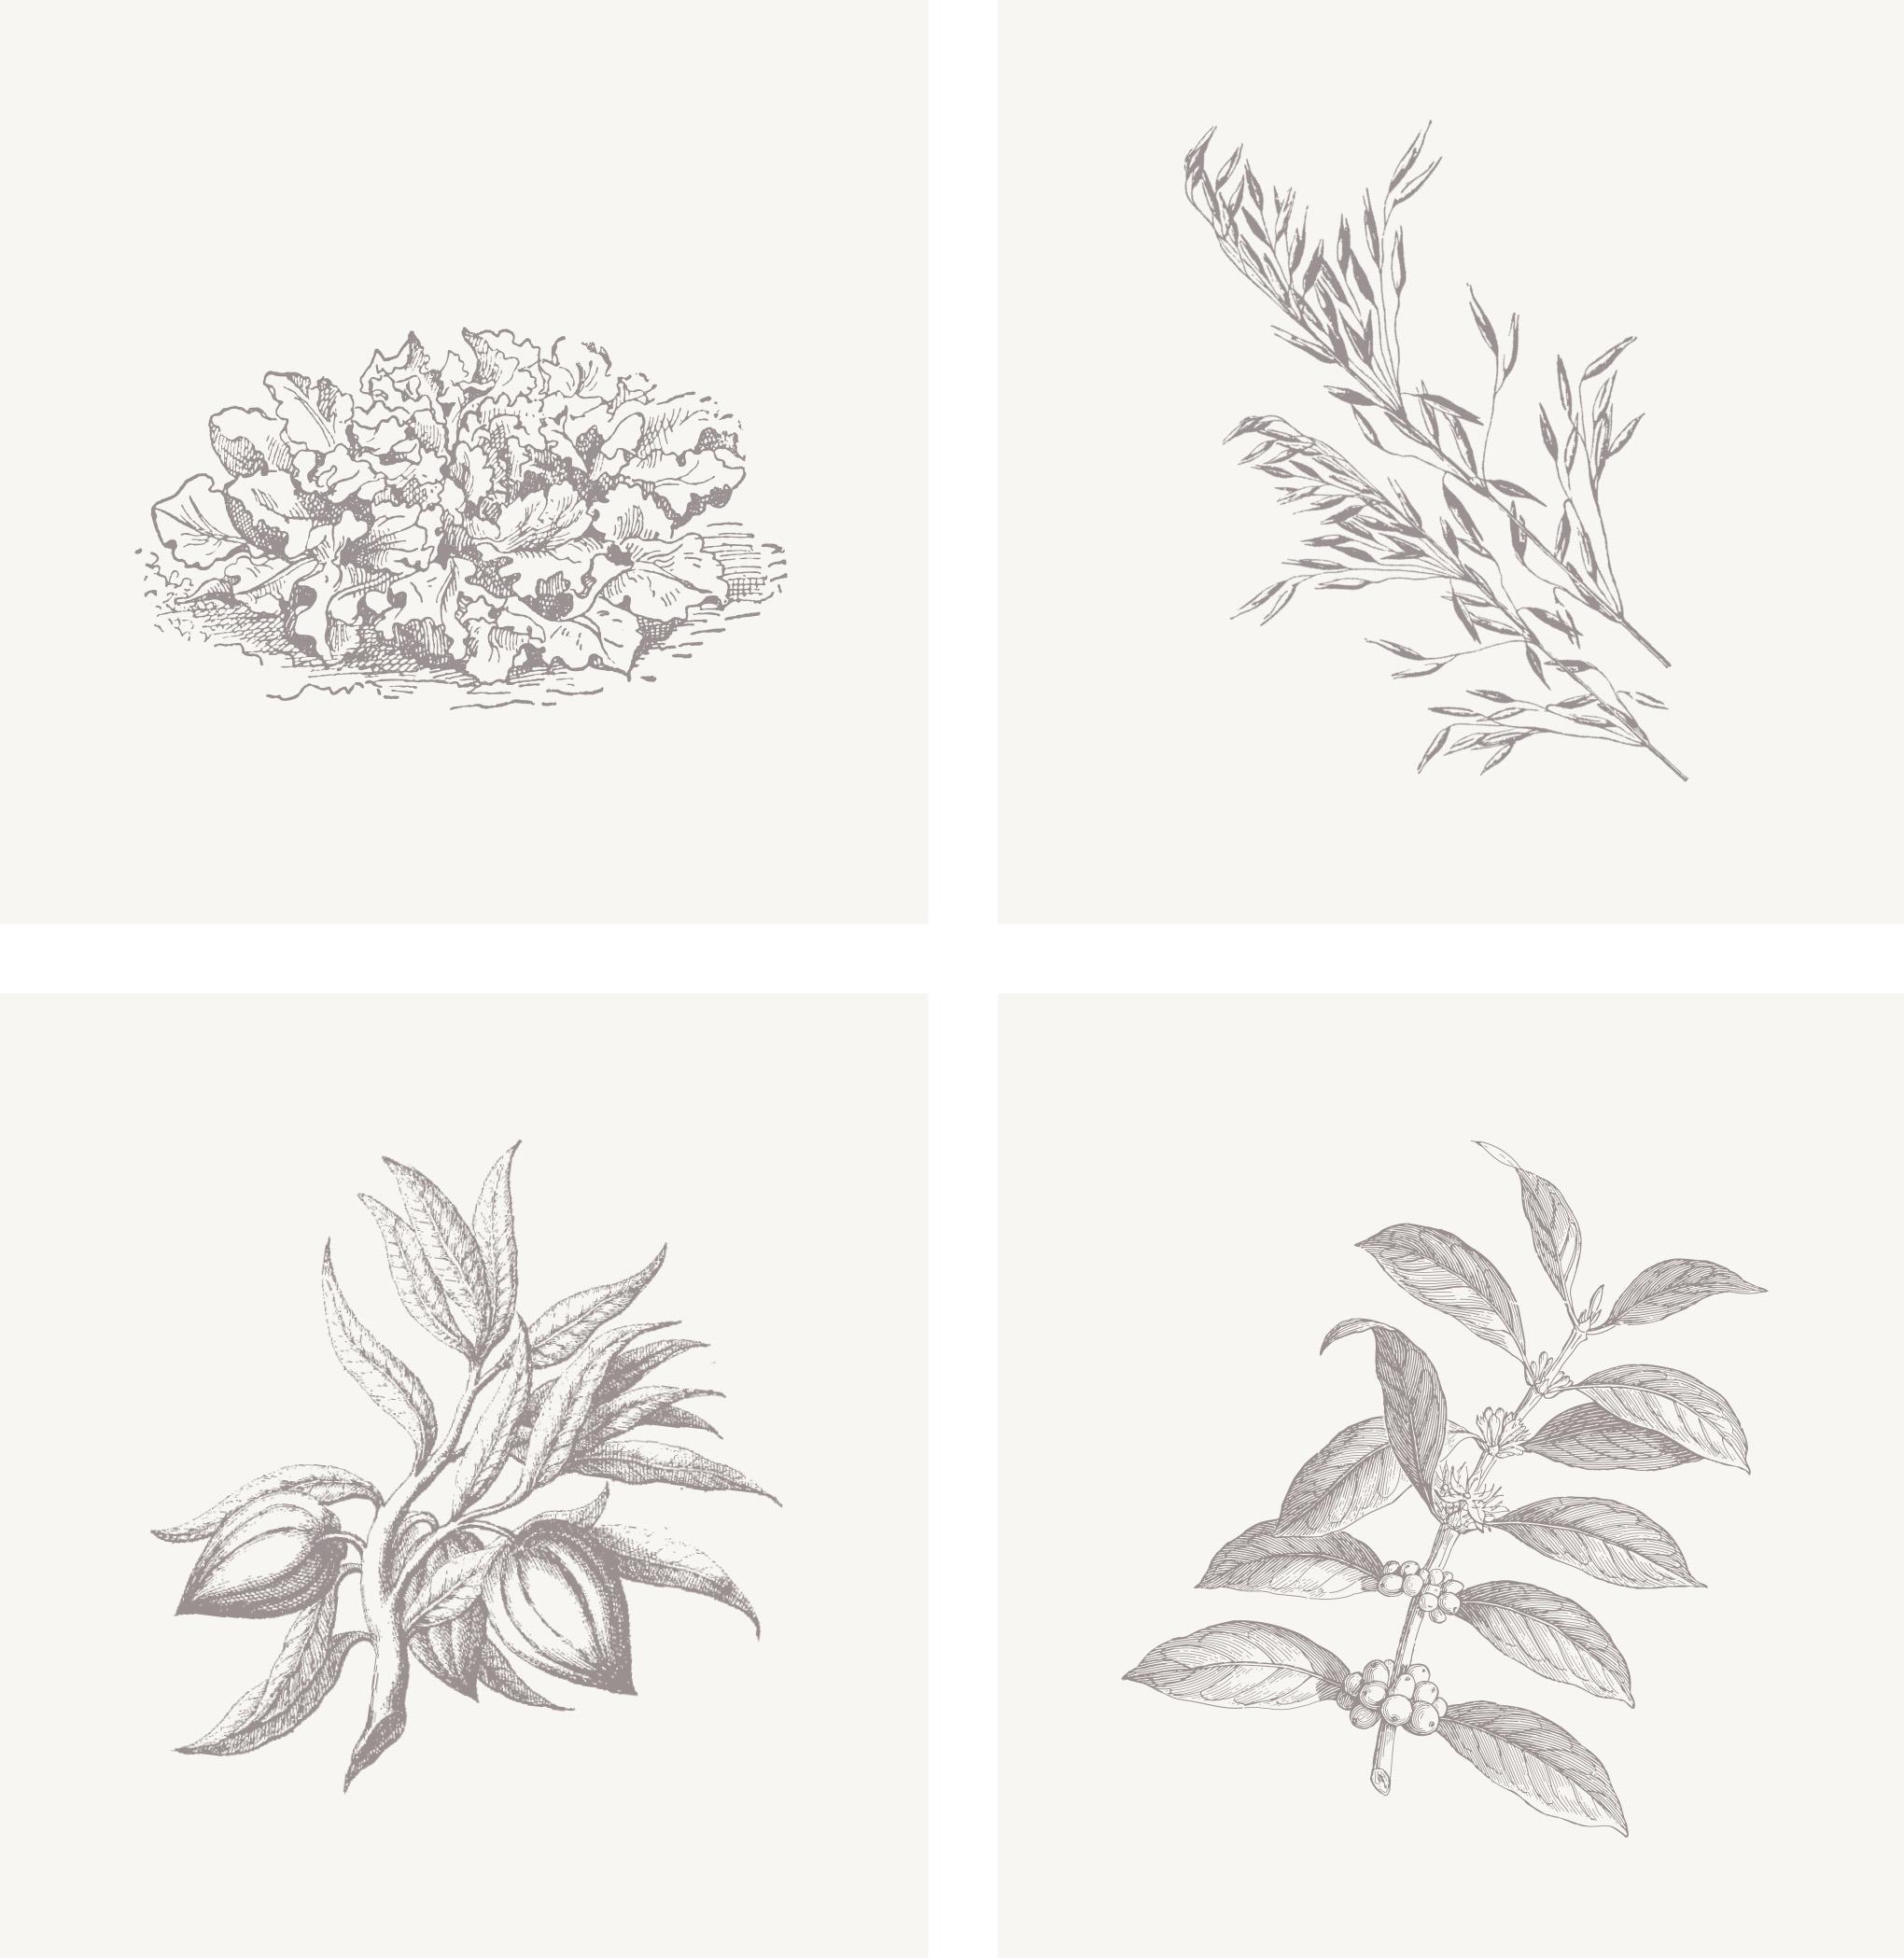 Lucia_illustrations2.jpg